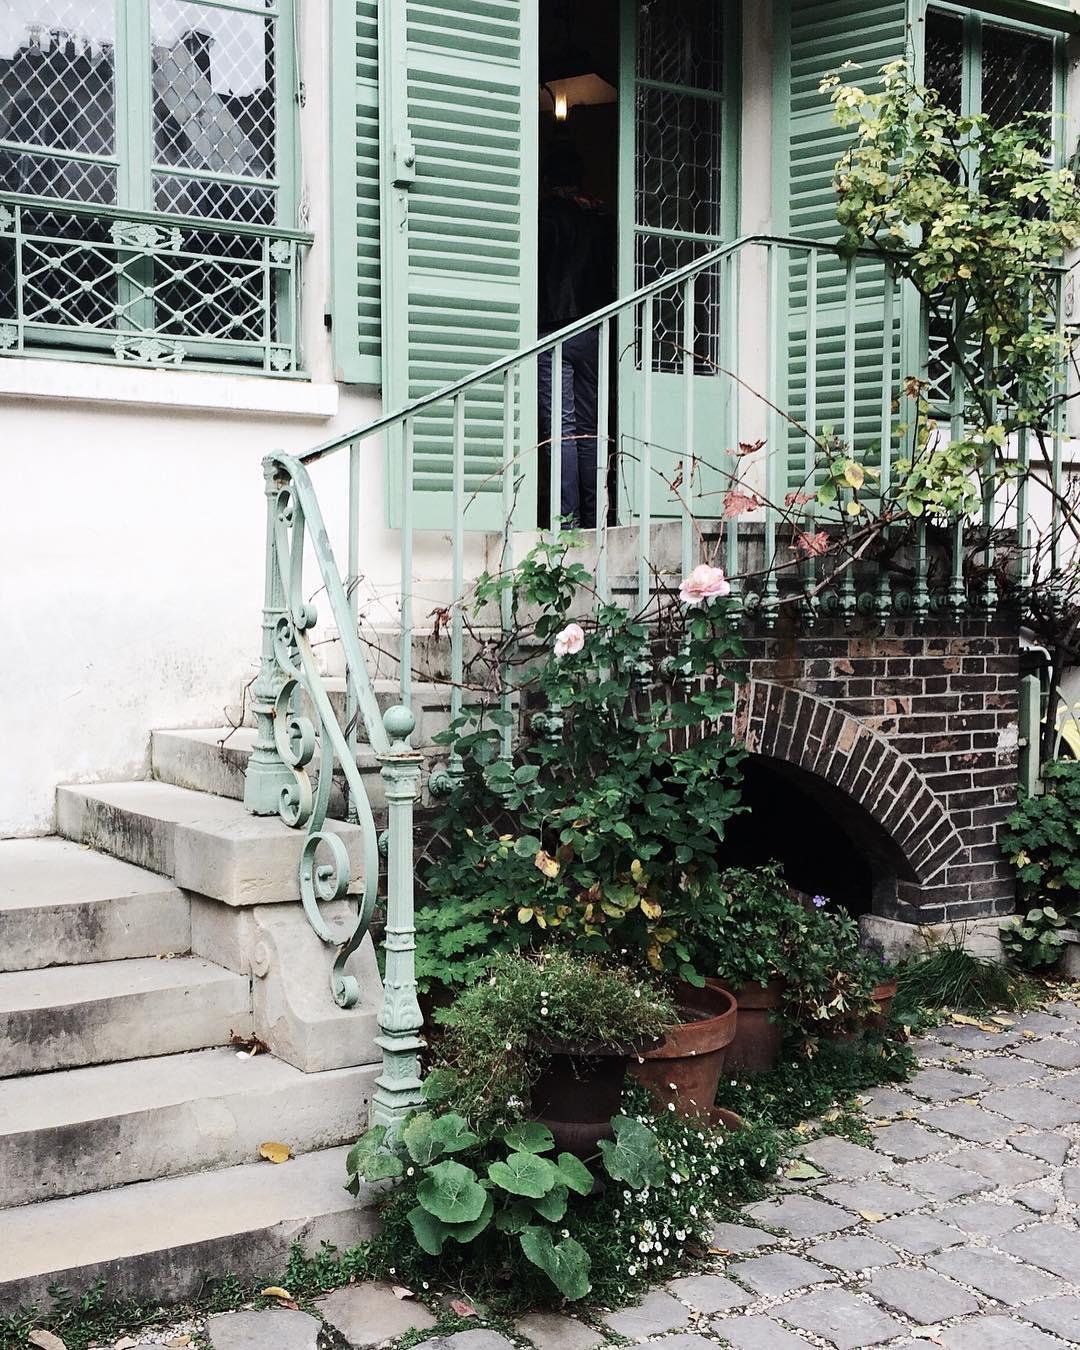 Romantic Things to Do in Paris - Stroll Around The Musée de la Vie Romantique